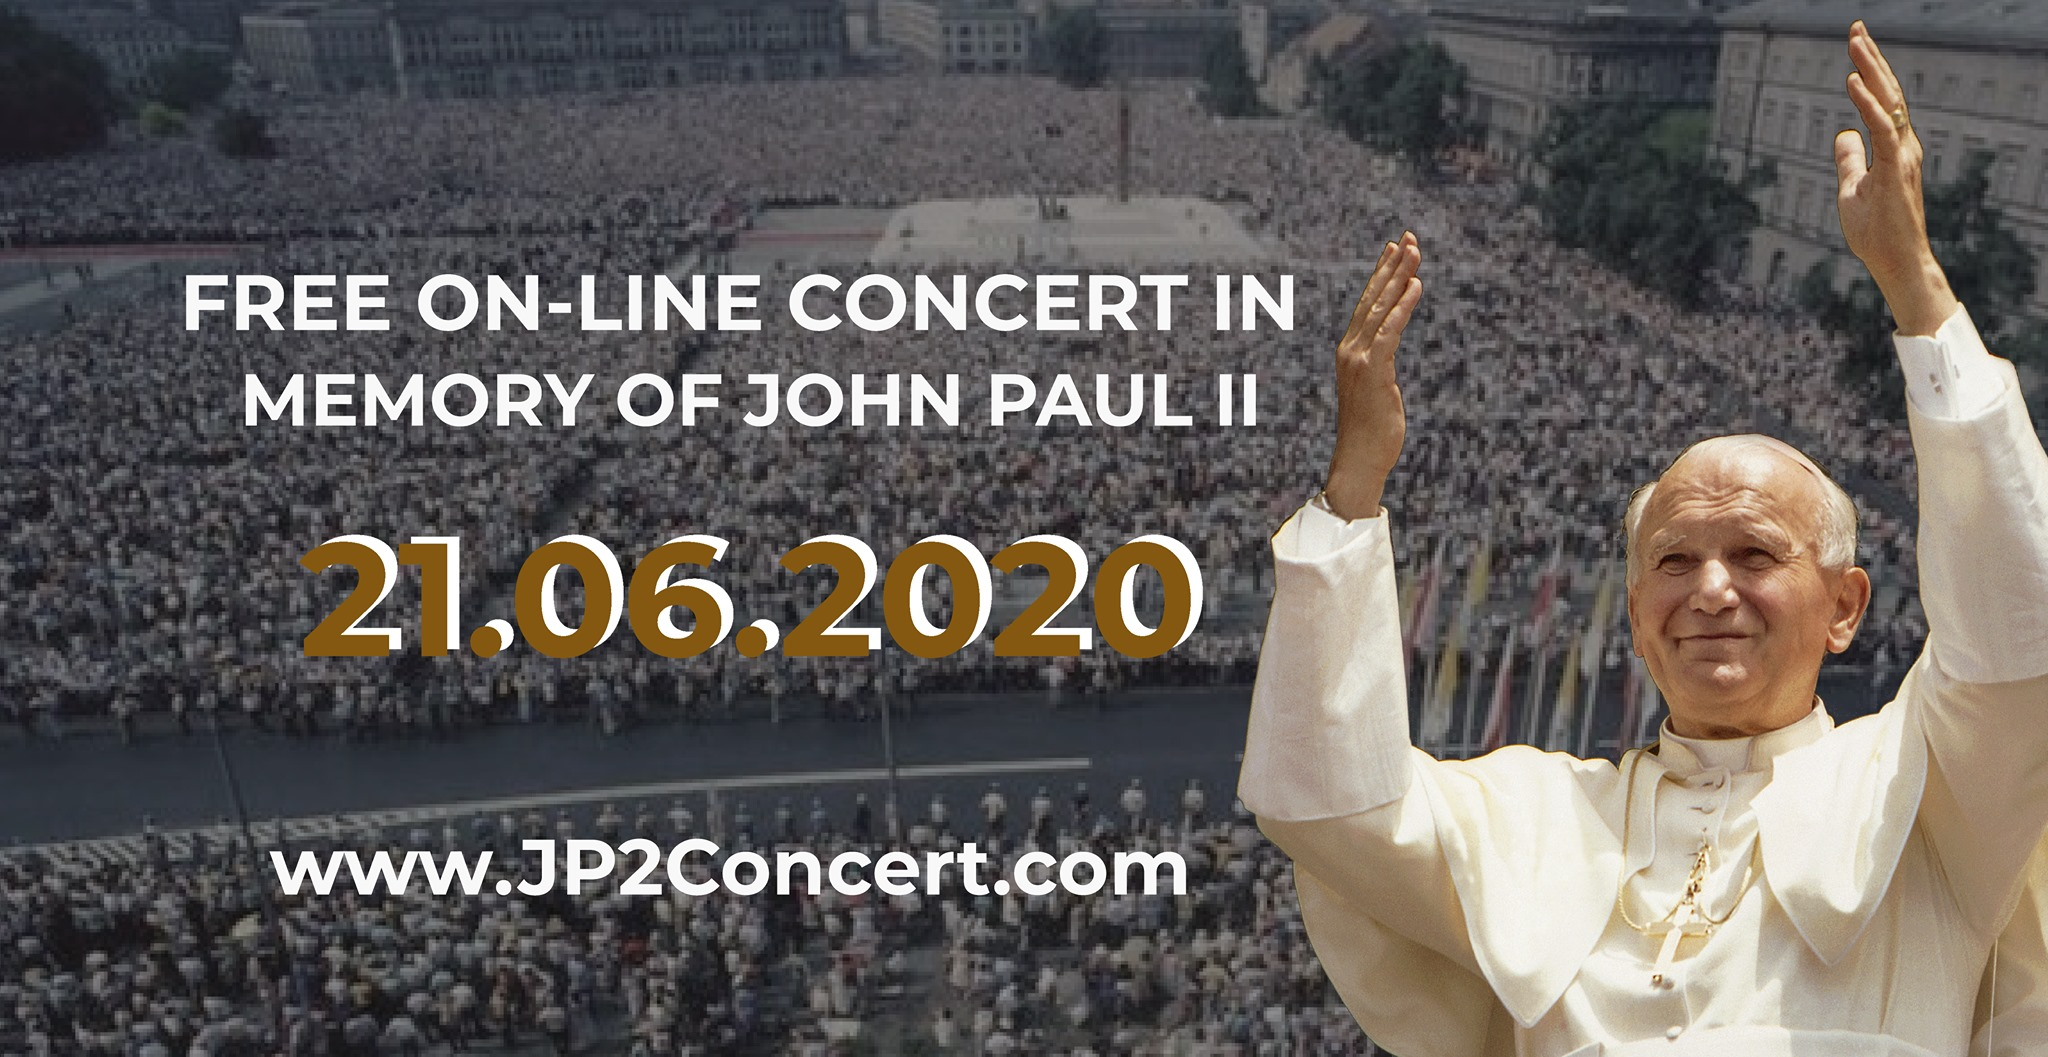 Concert in Memory of John Paul II - Online this Sunday, June 21